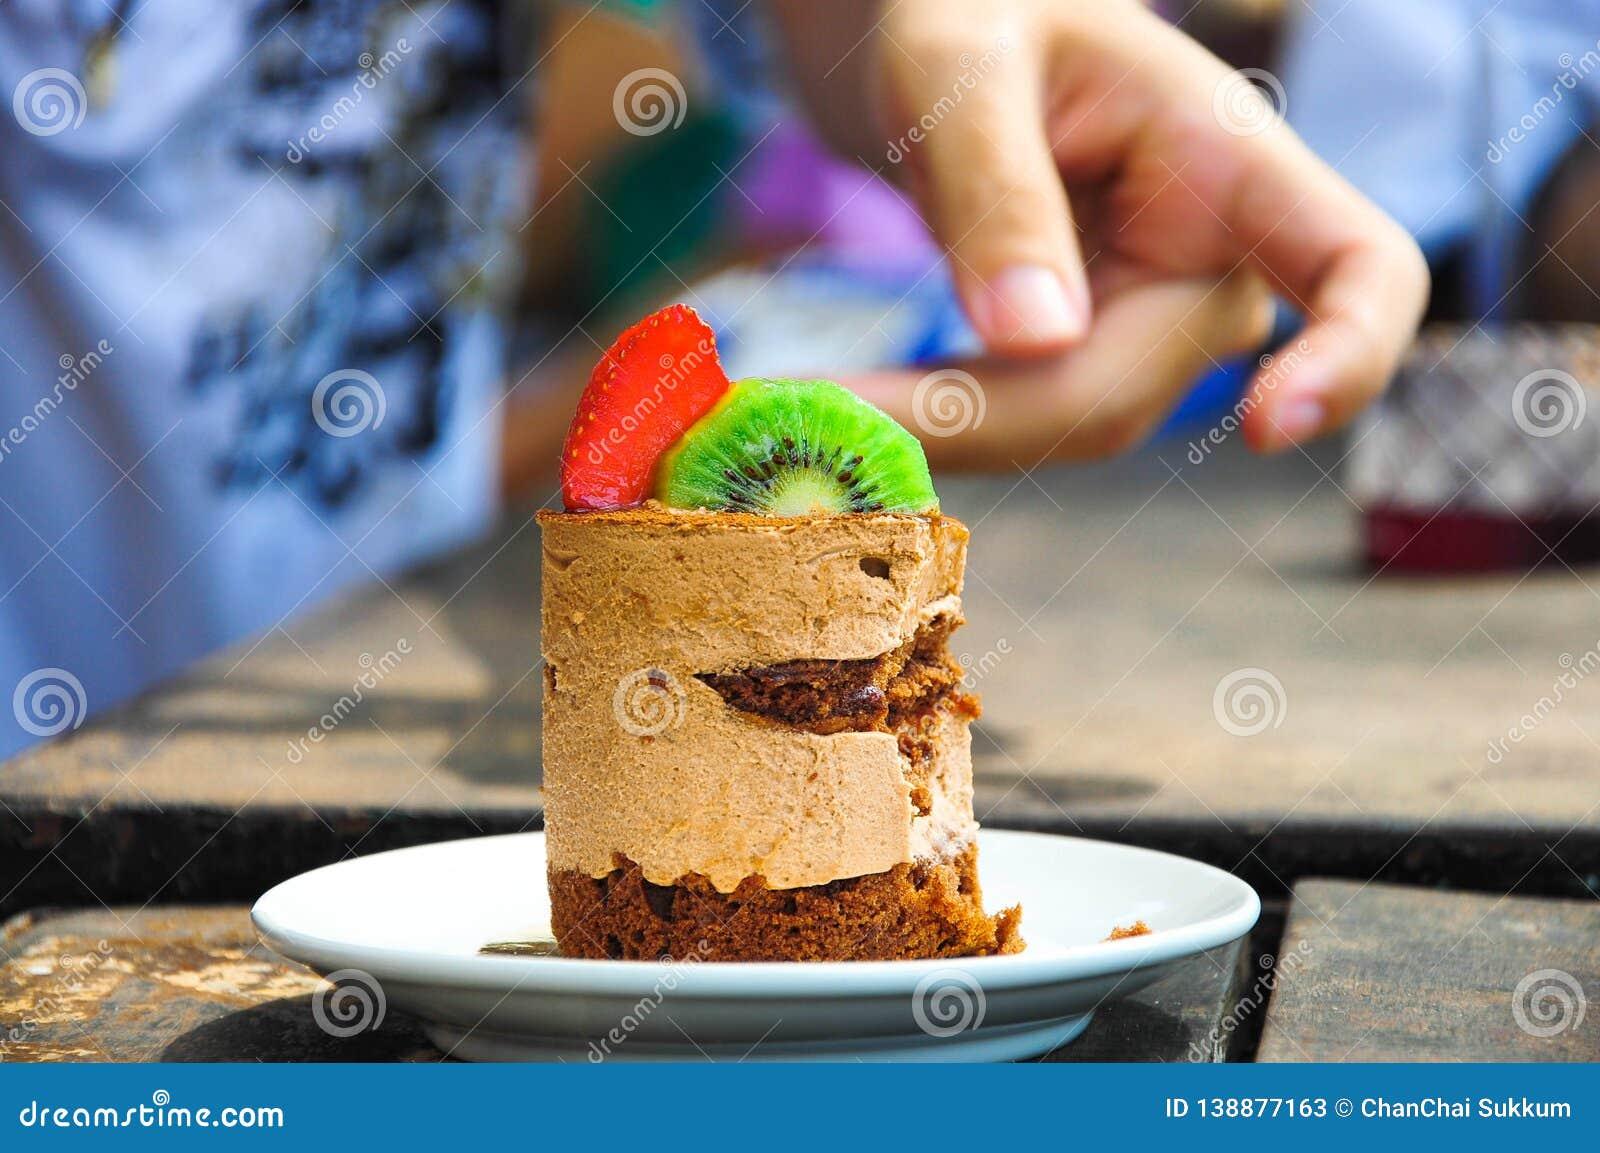 Before eating fruit cake